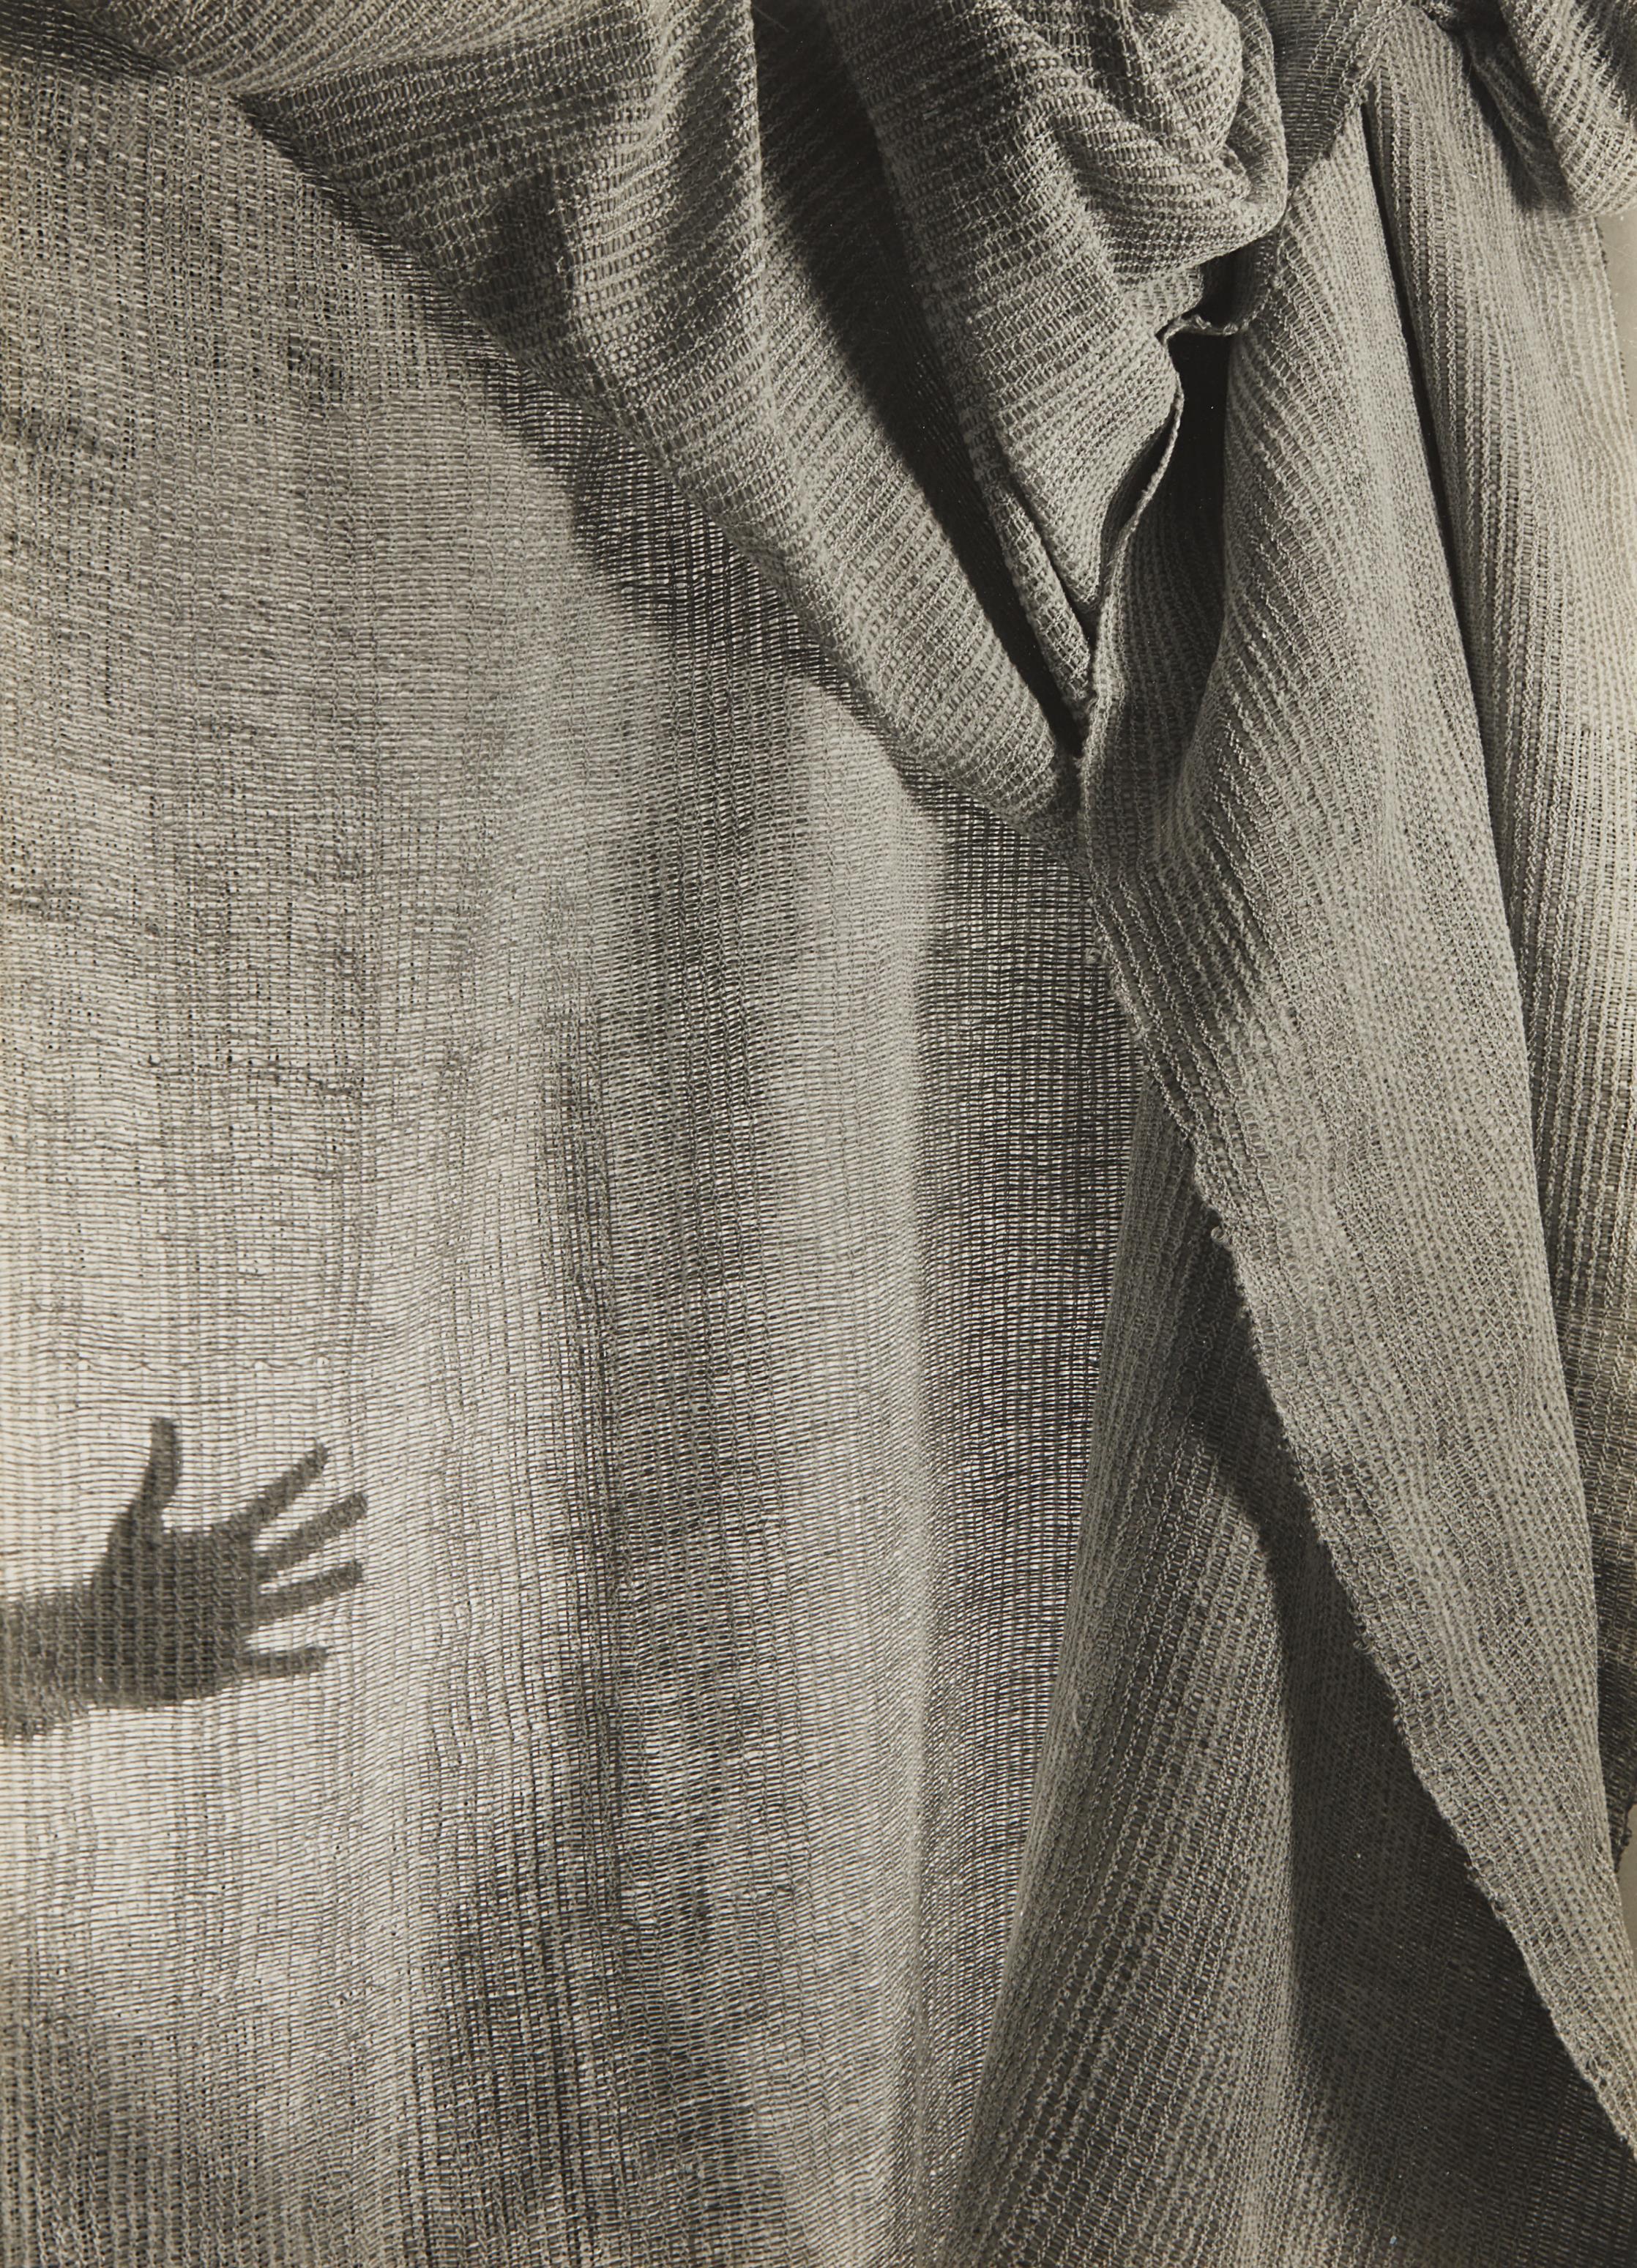 Imogen Cunningham-Hand Weaving with Hand-1946